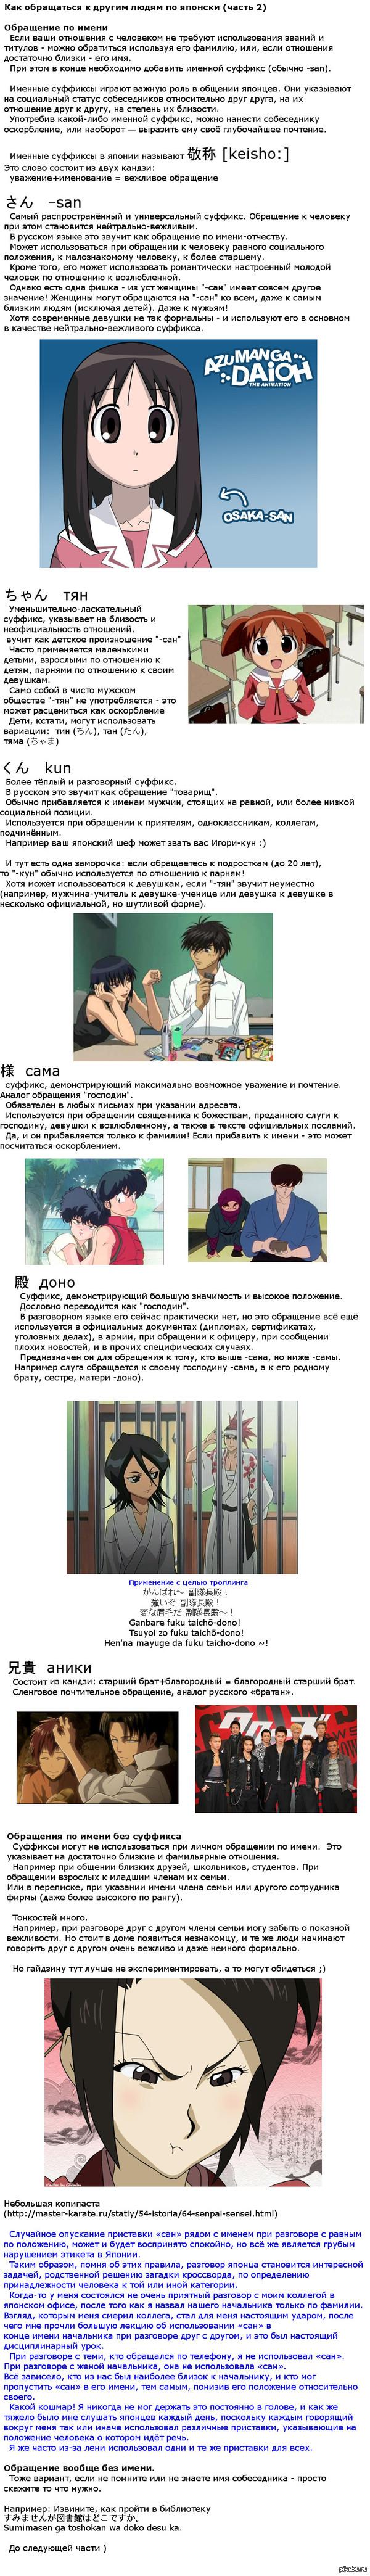 "Как обращаться к другим людям по японски? (часть 2) Предыдущая здесь: <a href=""http://pikabu.ru/story/kak_obrashchatsya_k_drugim_lyudyam_po_yaponski_chast1_3060809"">http://pikabu.ru/story/_3060809</a>"